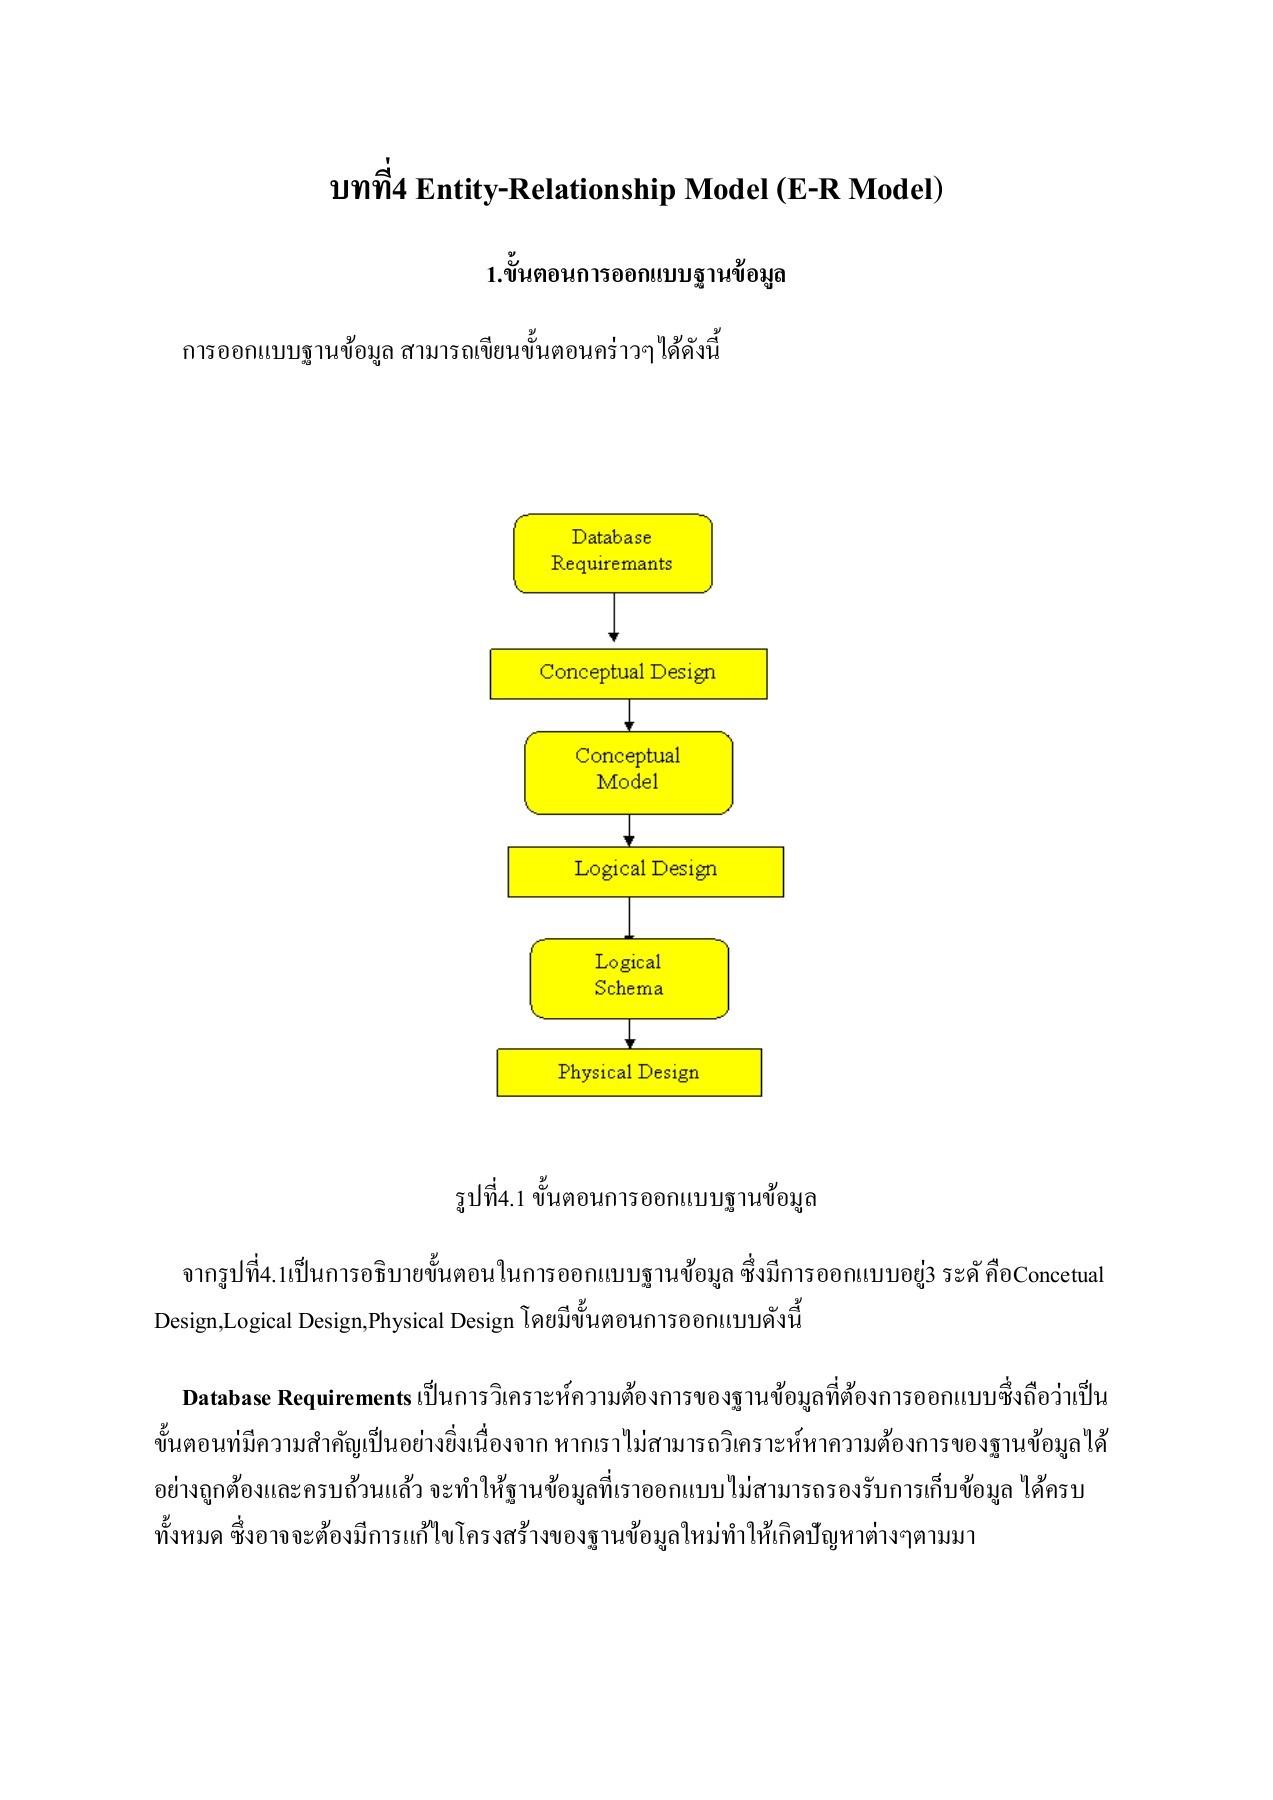 4.entity-Relationship Model (E-R Model) regarding Er Diagram 8Nv